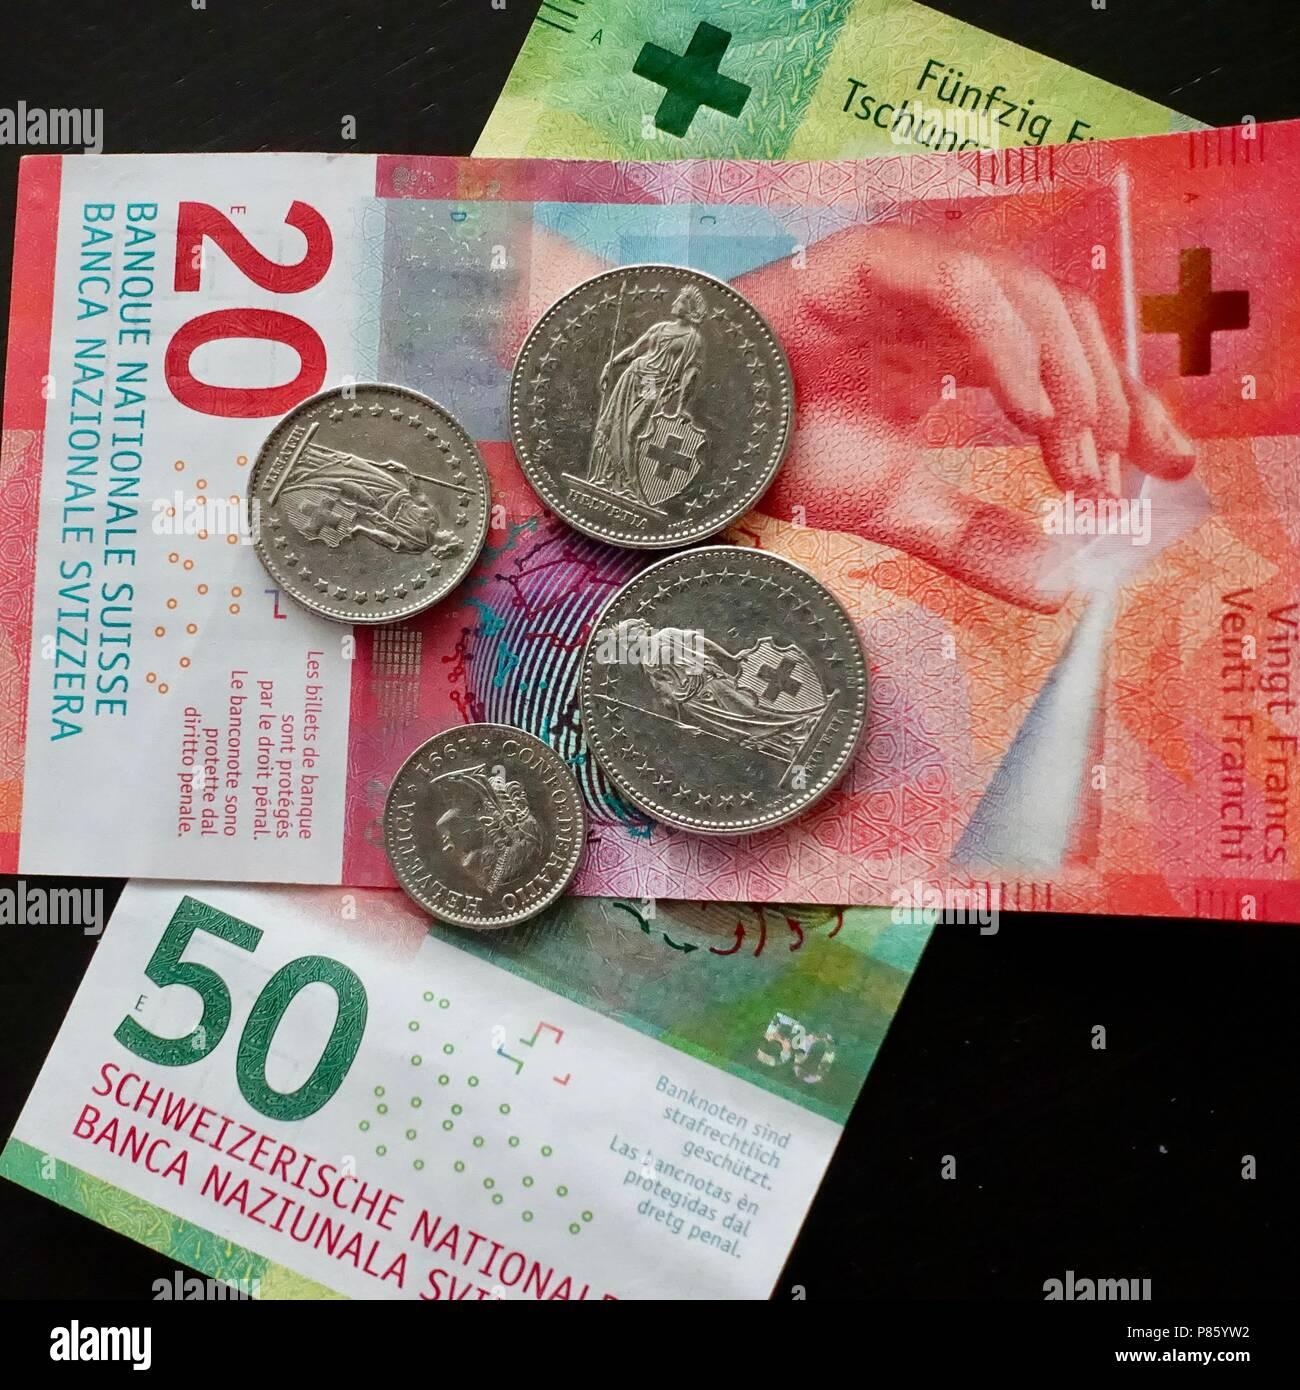 Swiss coins and bills on dark background. Currency used in Switzerland and Liechtenstein. - Stock Image